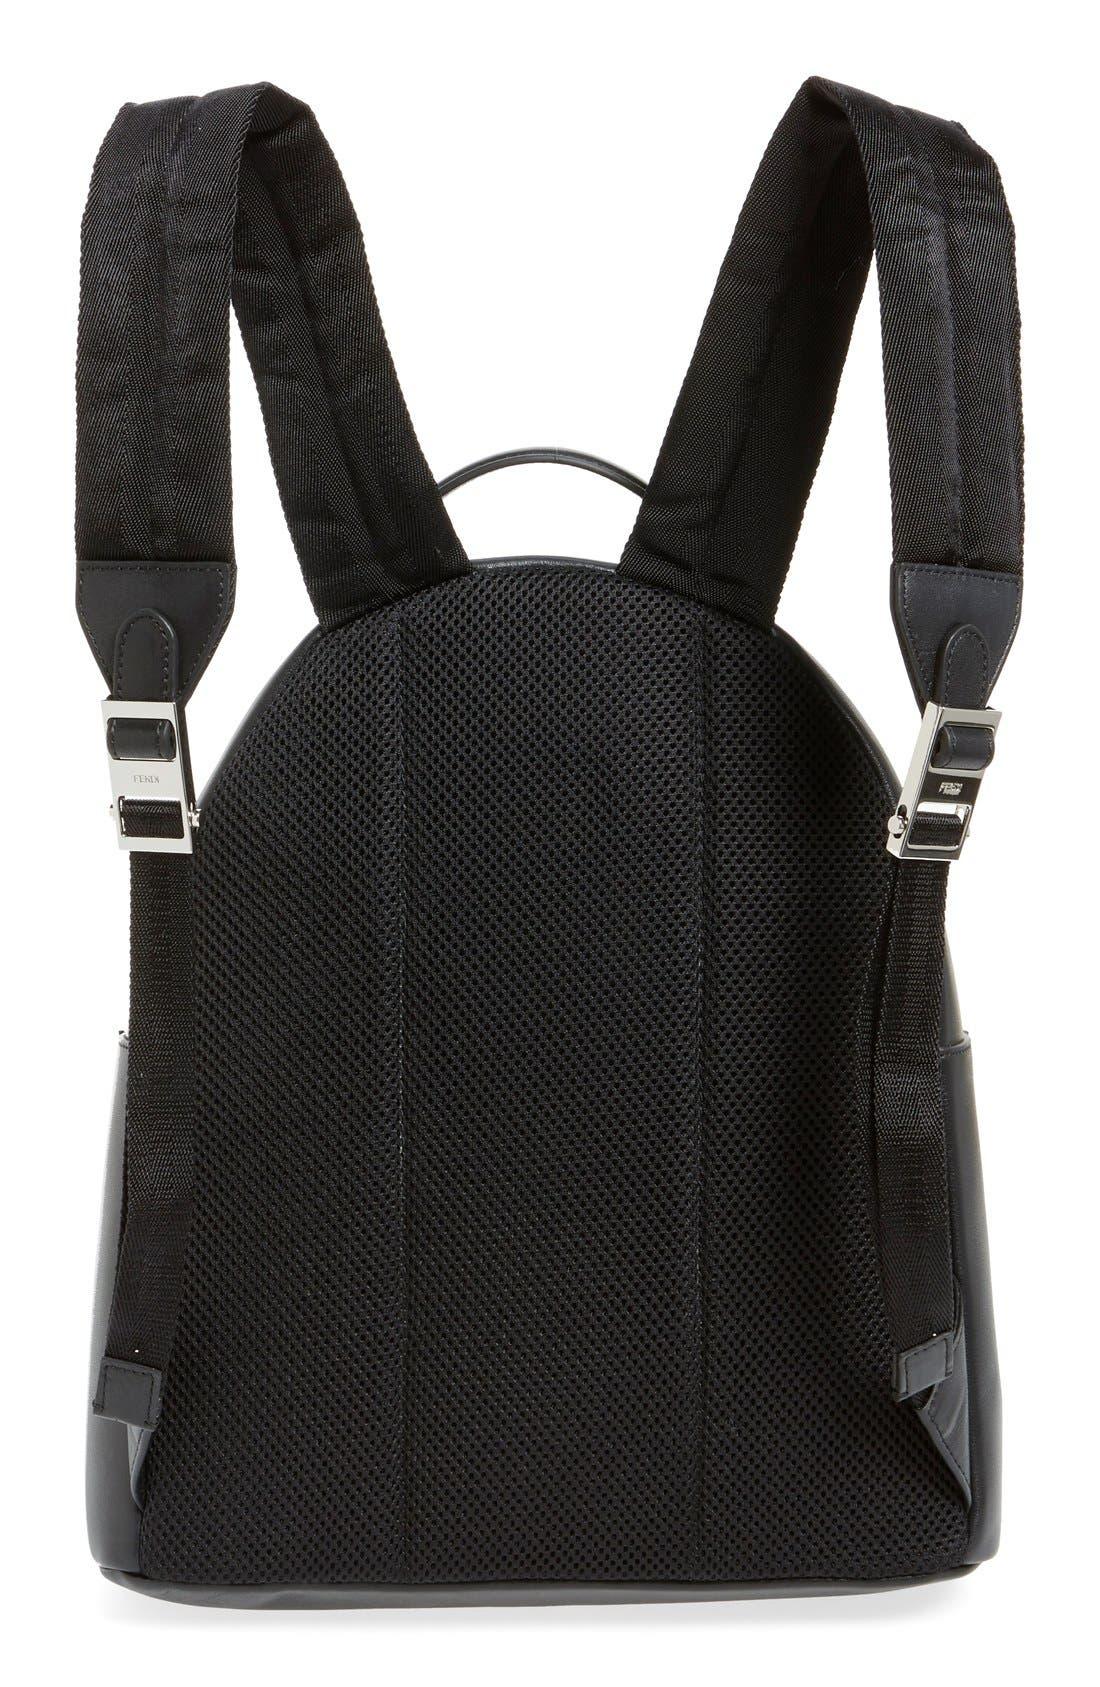 Alternate Image 3  - Fendi 'Monster' Leather Backpack with Genuine Fox Fur & Snakeskin Trim